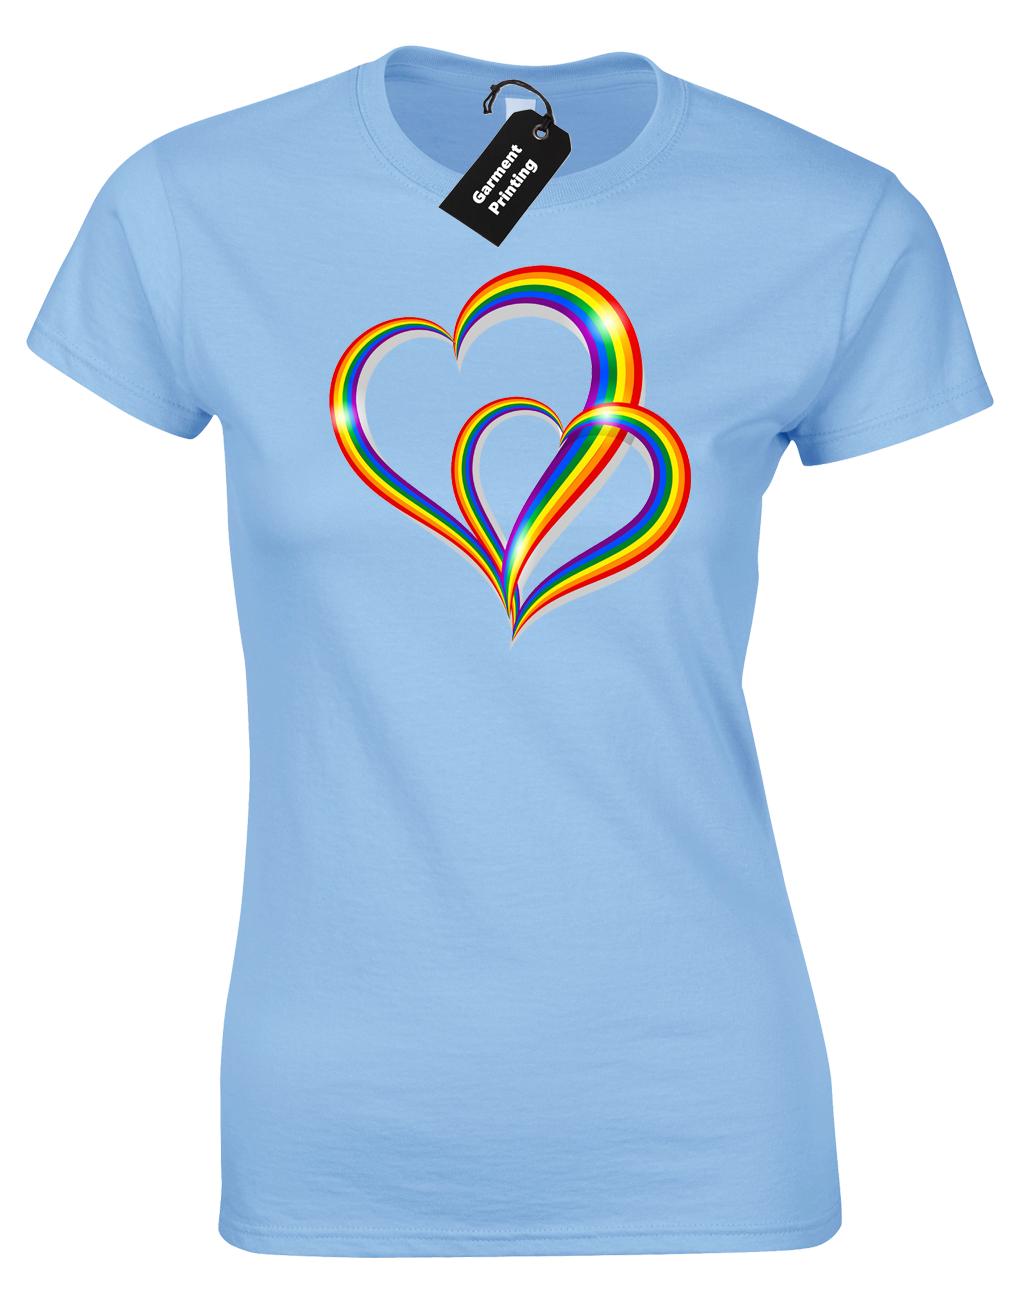 2 Pride Hearts Ladies T-Shirt Gay Lesbian Lgbt Unisex Rainbow Womens Top ( Col) 7